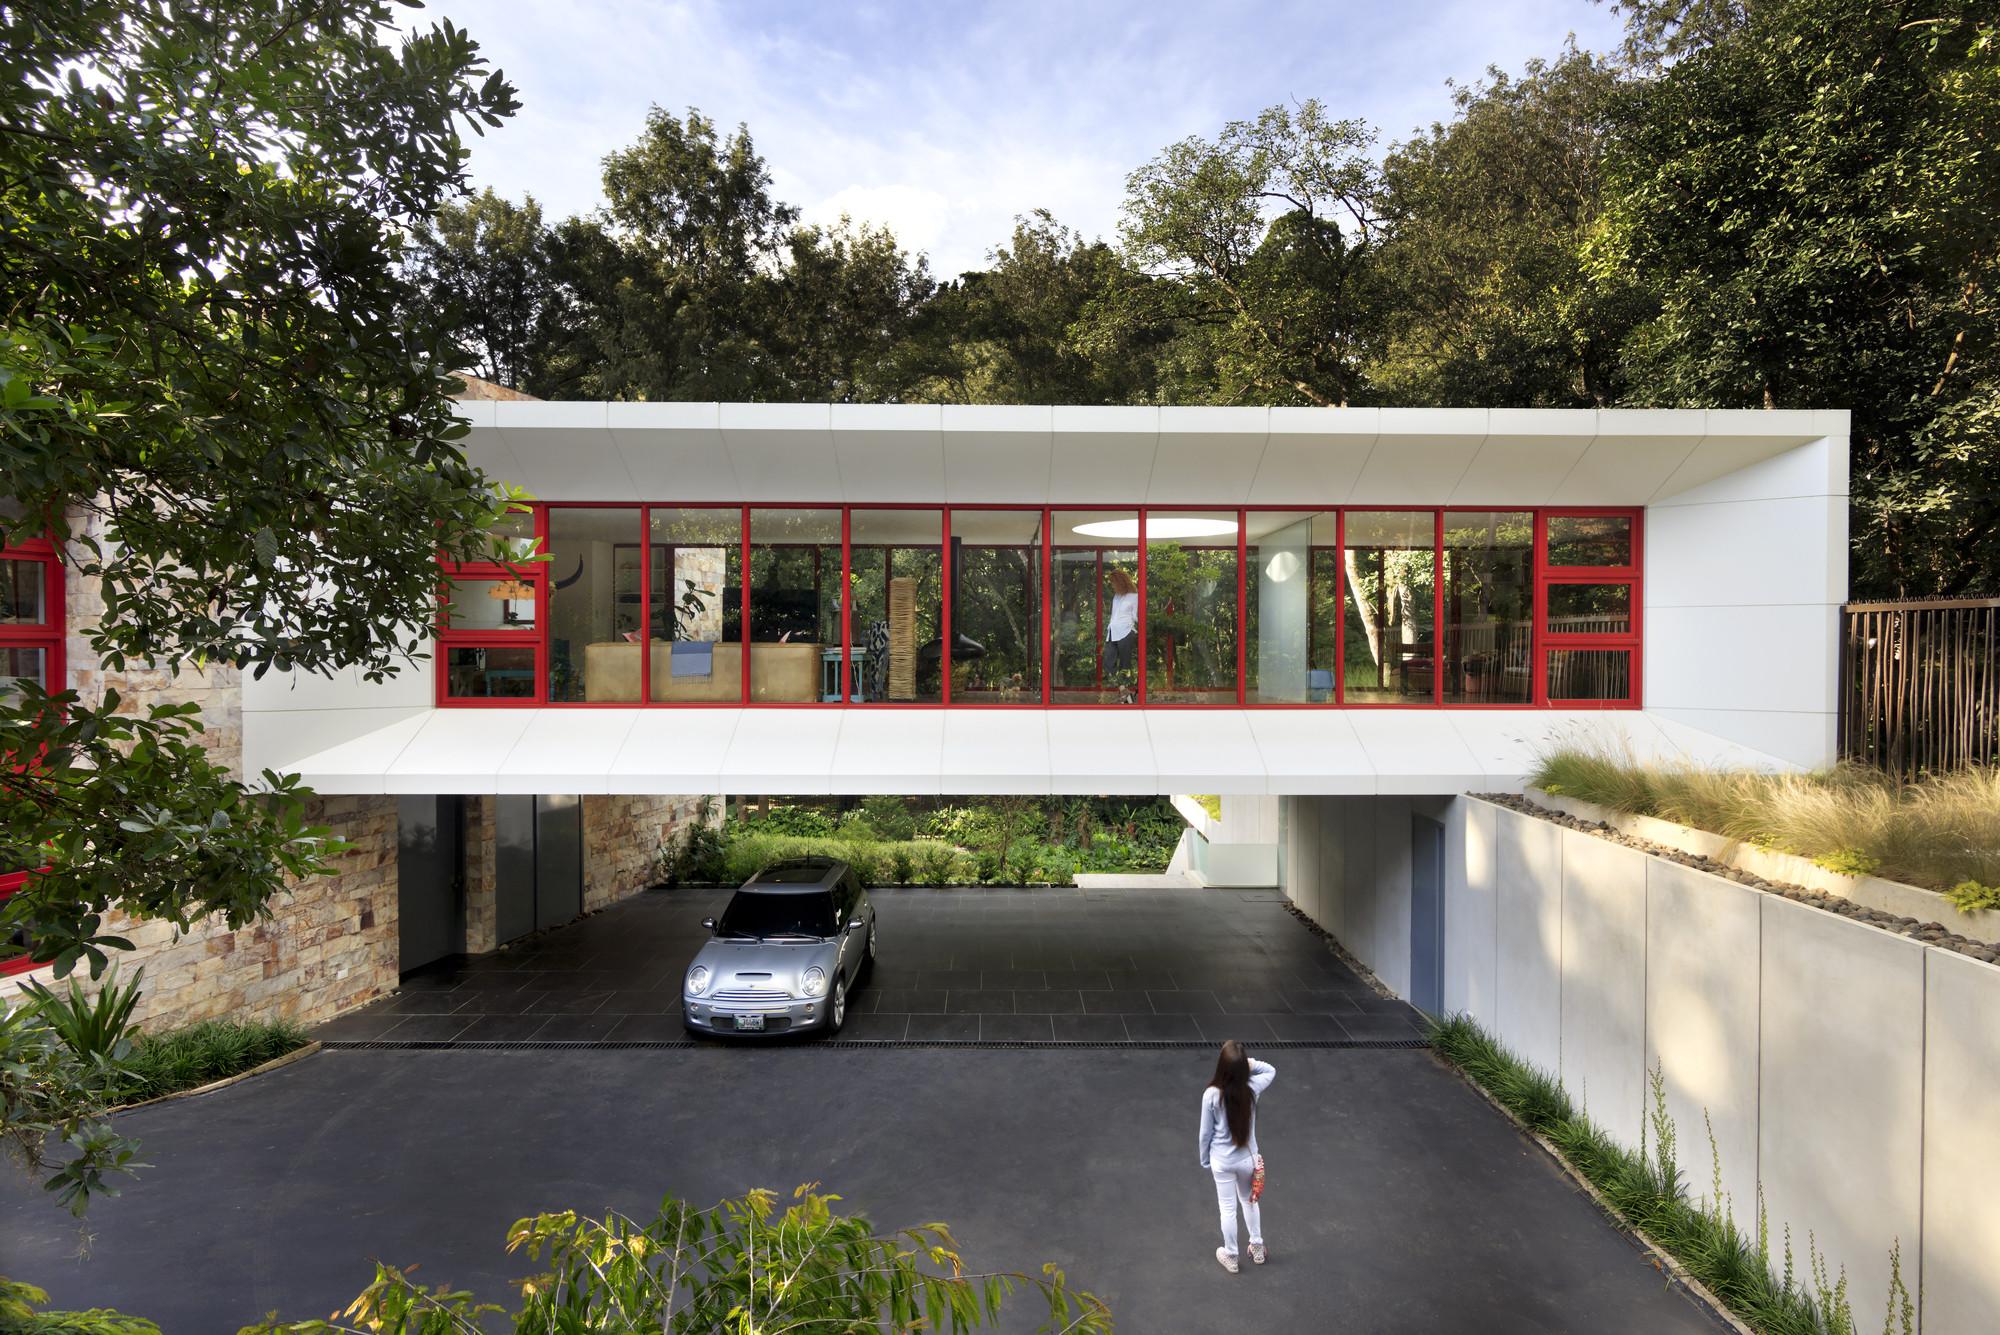 Chinkara House / Solis Colomer Arquitectos, © Marko Bradich